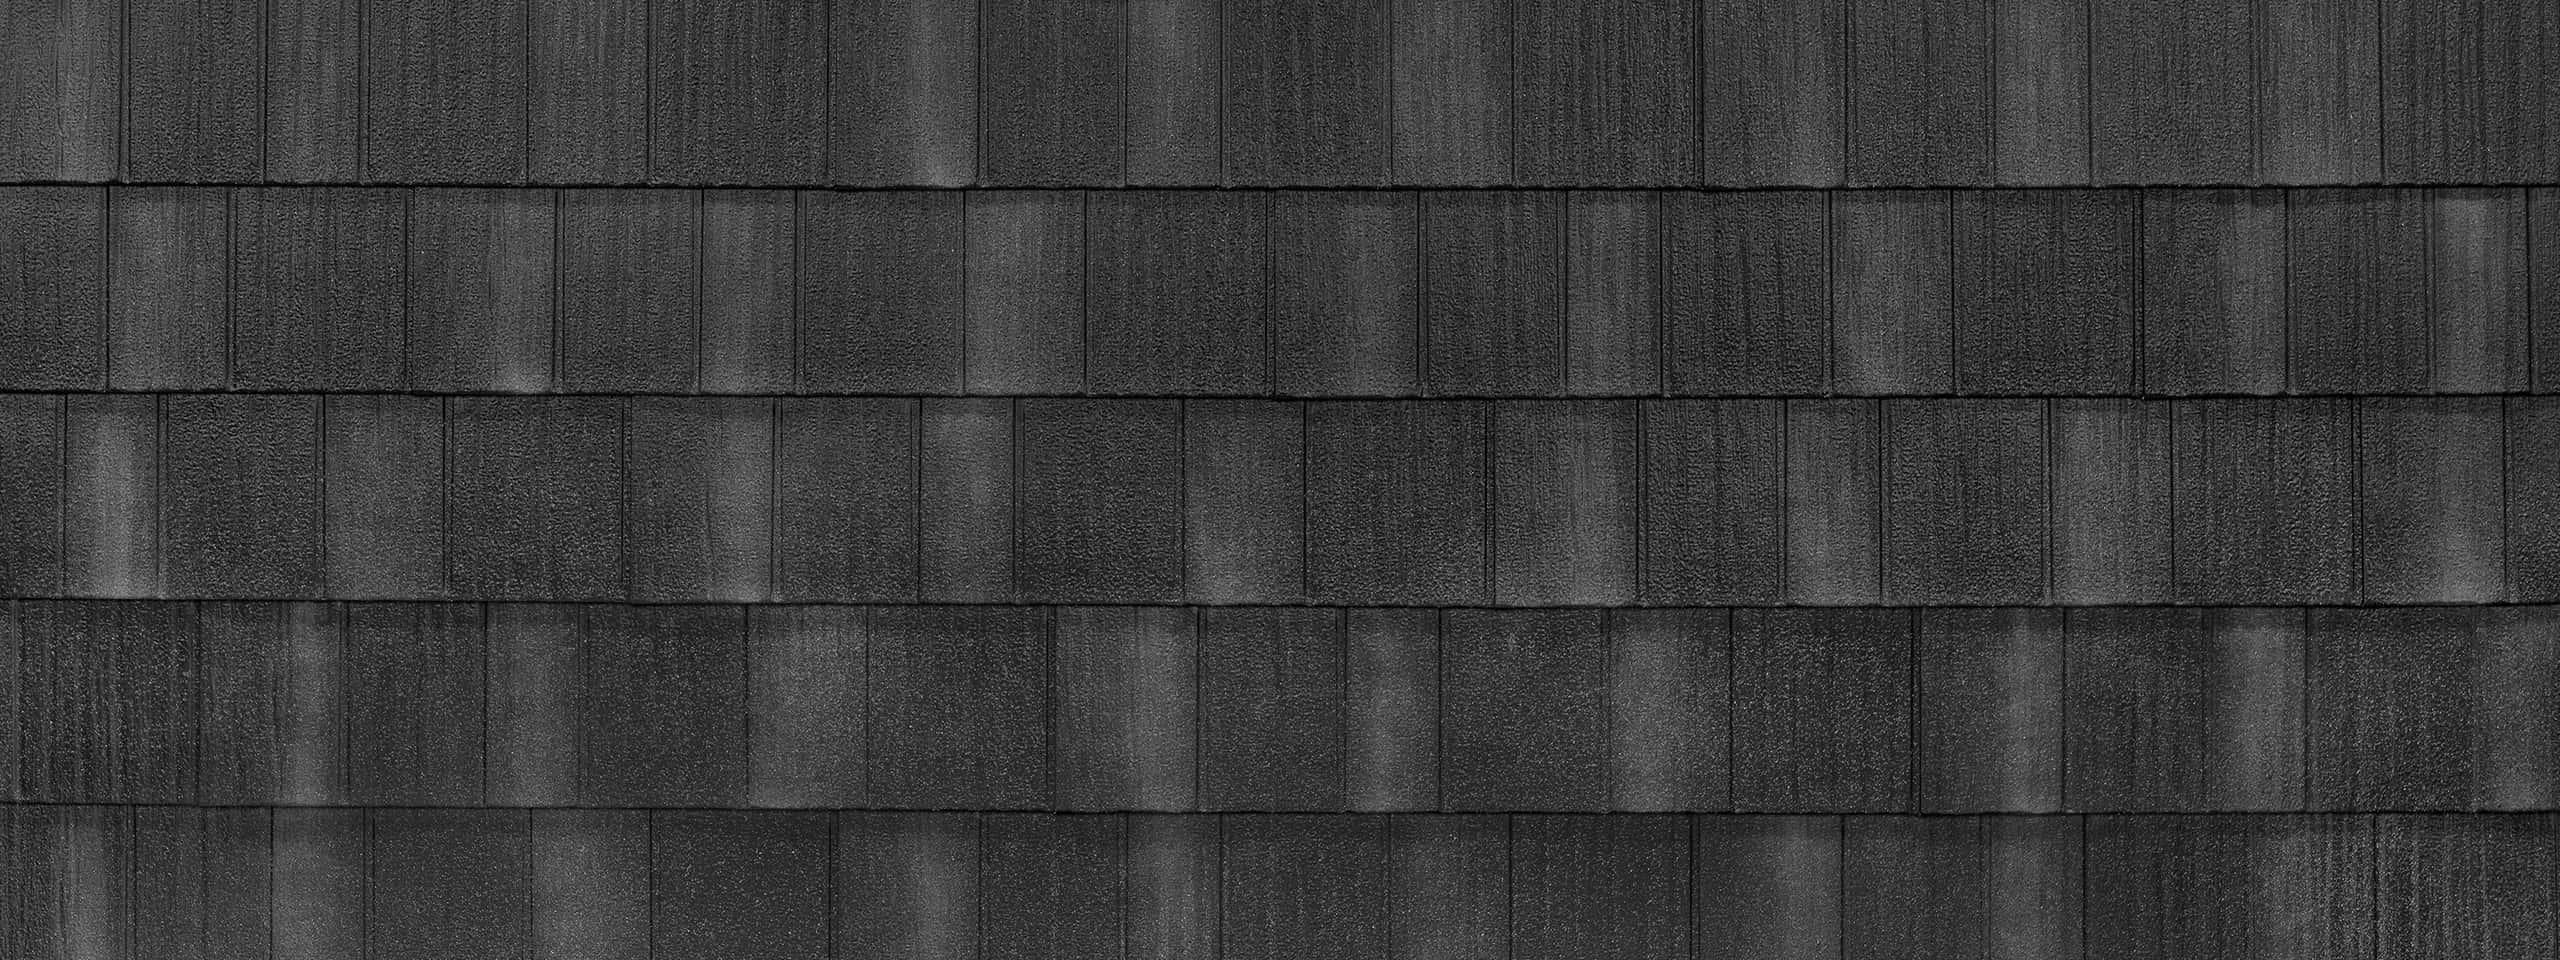 EDCO Infiniti® Textured Steel Shake Obsidian Swatch